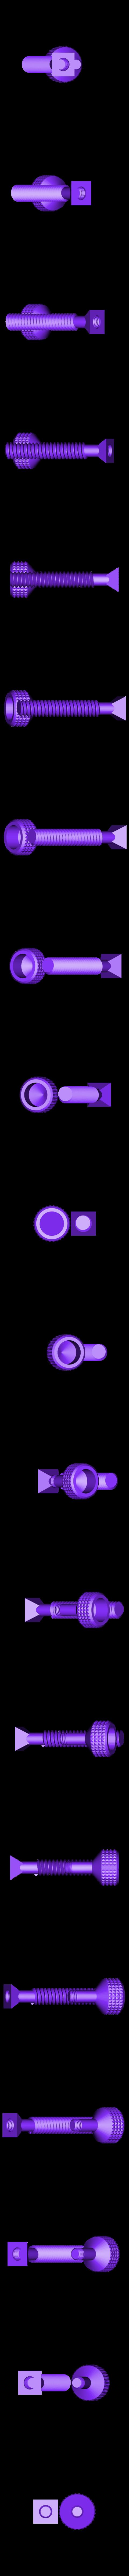 Screw.STL Download free STL file Platform Jack  [Fully Assembled, No Supports] • Object to 3D print, Bolrod